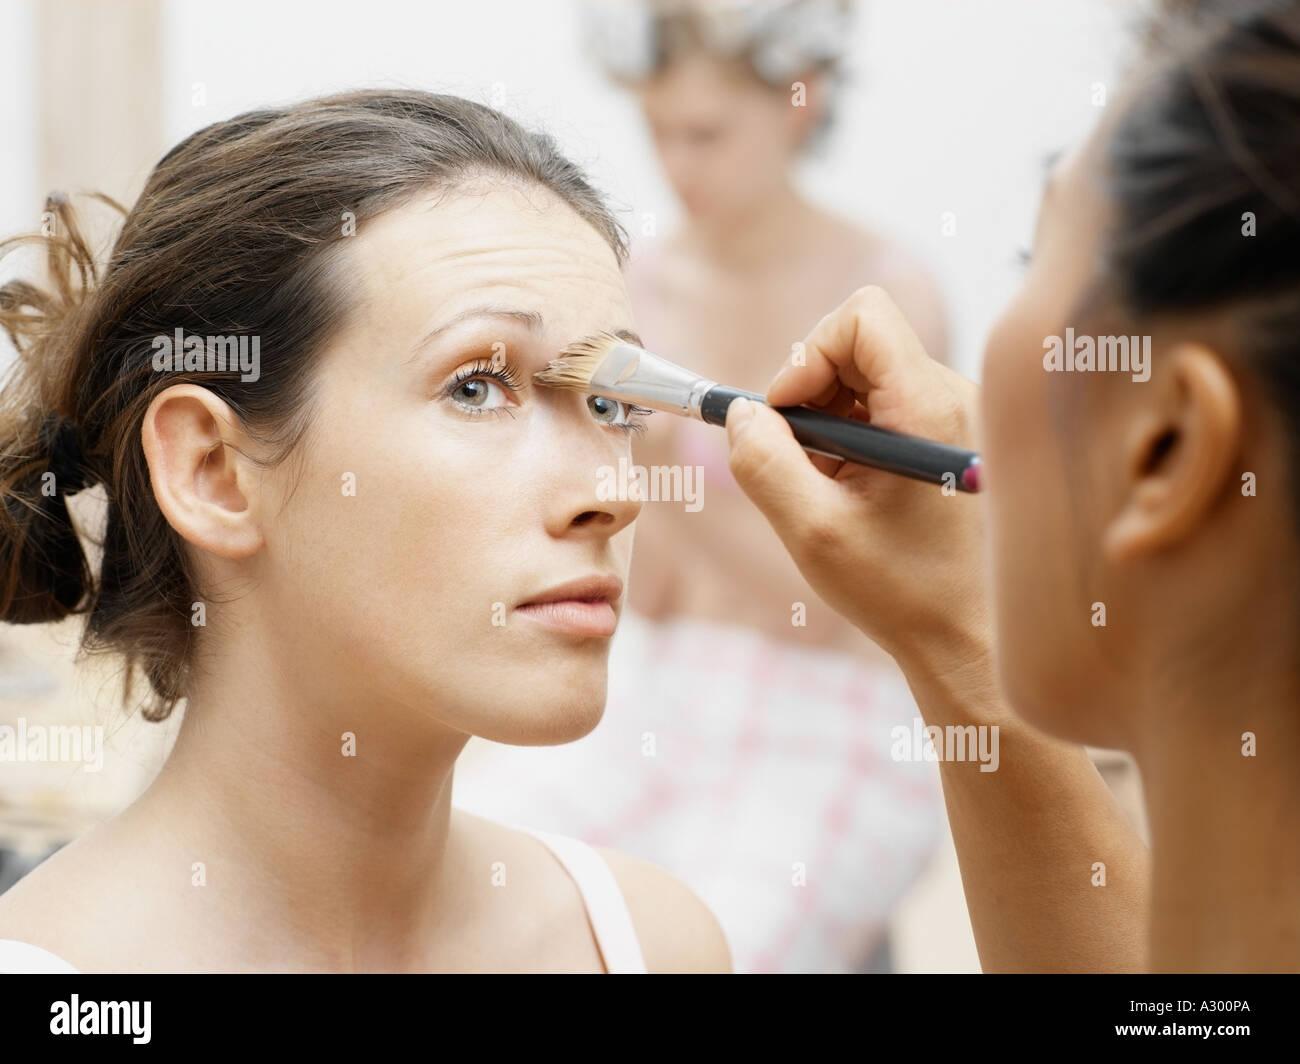 Model having make-up done - Stock Image